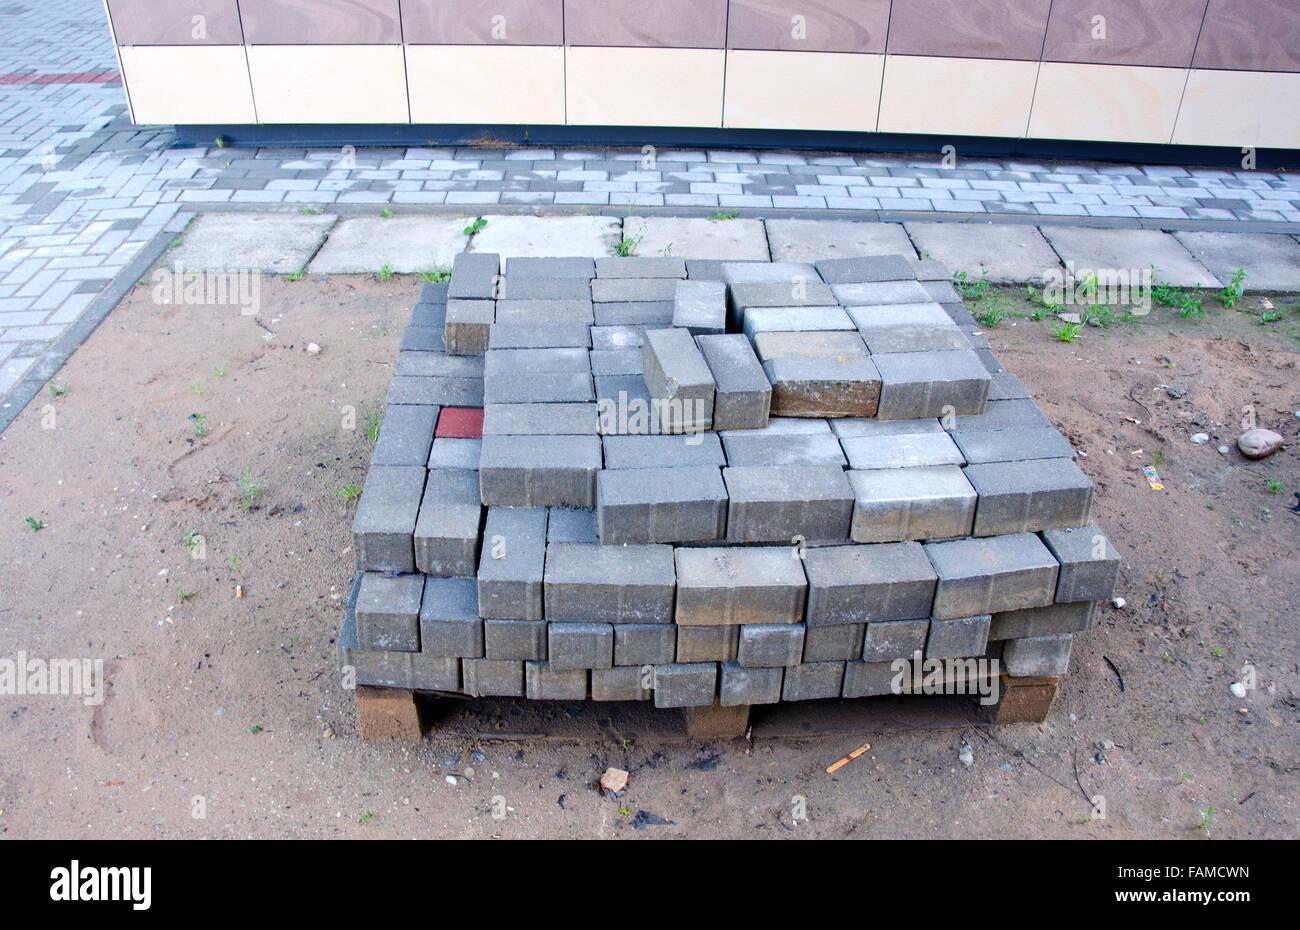 Bricks Tiles Paving Stock Photos & Bricks Tiles Paving Stock Images ...